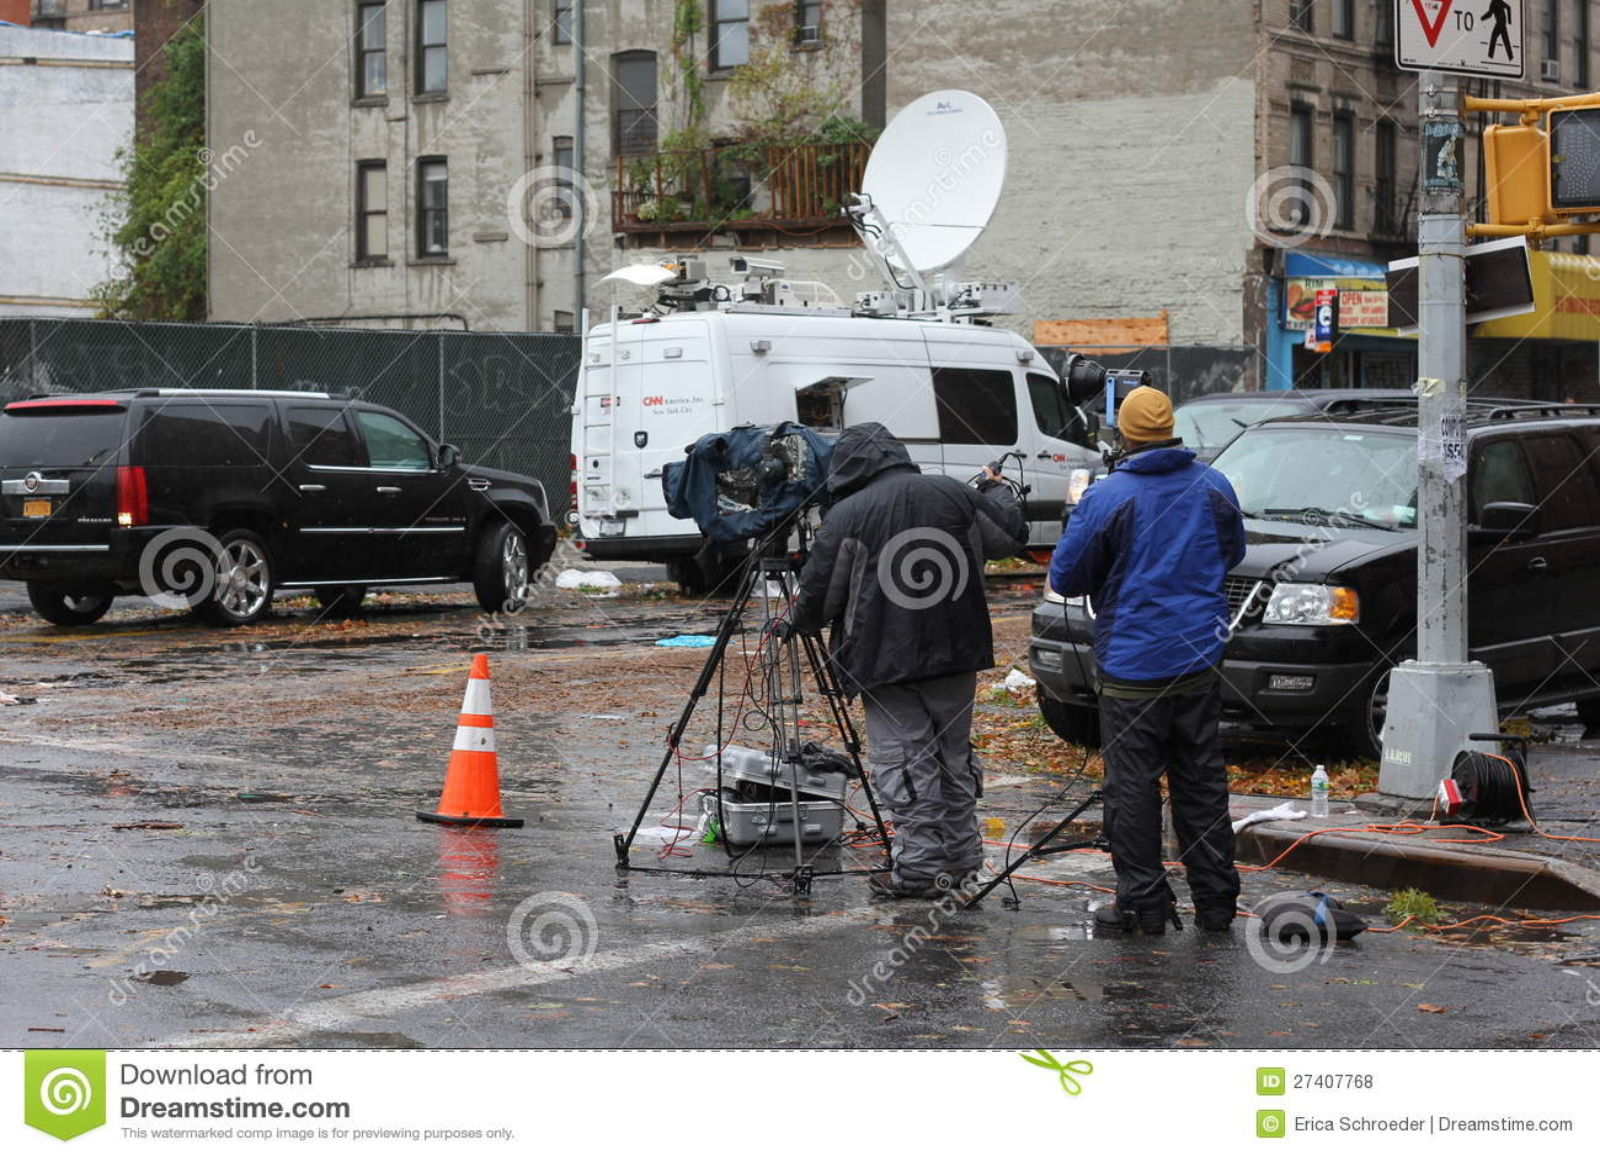 foto Filming during Hurricane Sandy